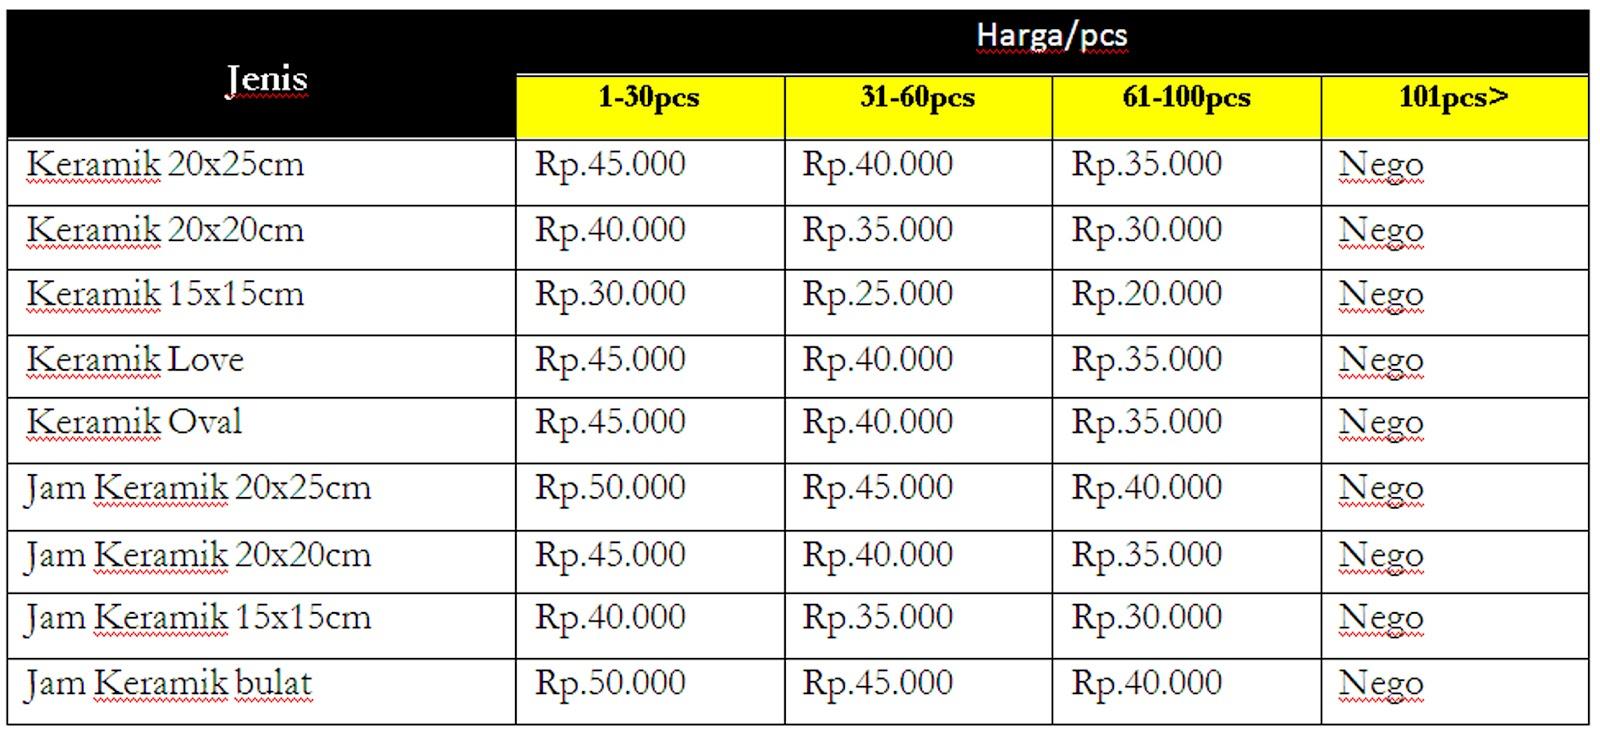 daftar harga keramik roman terbaru 2015 terlengkapHarga Bahan Bangunan